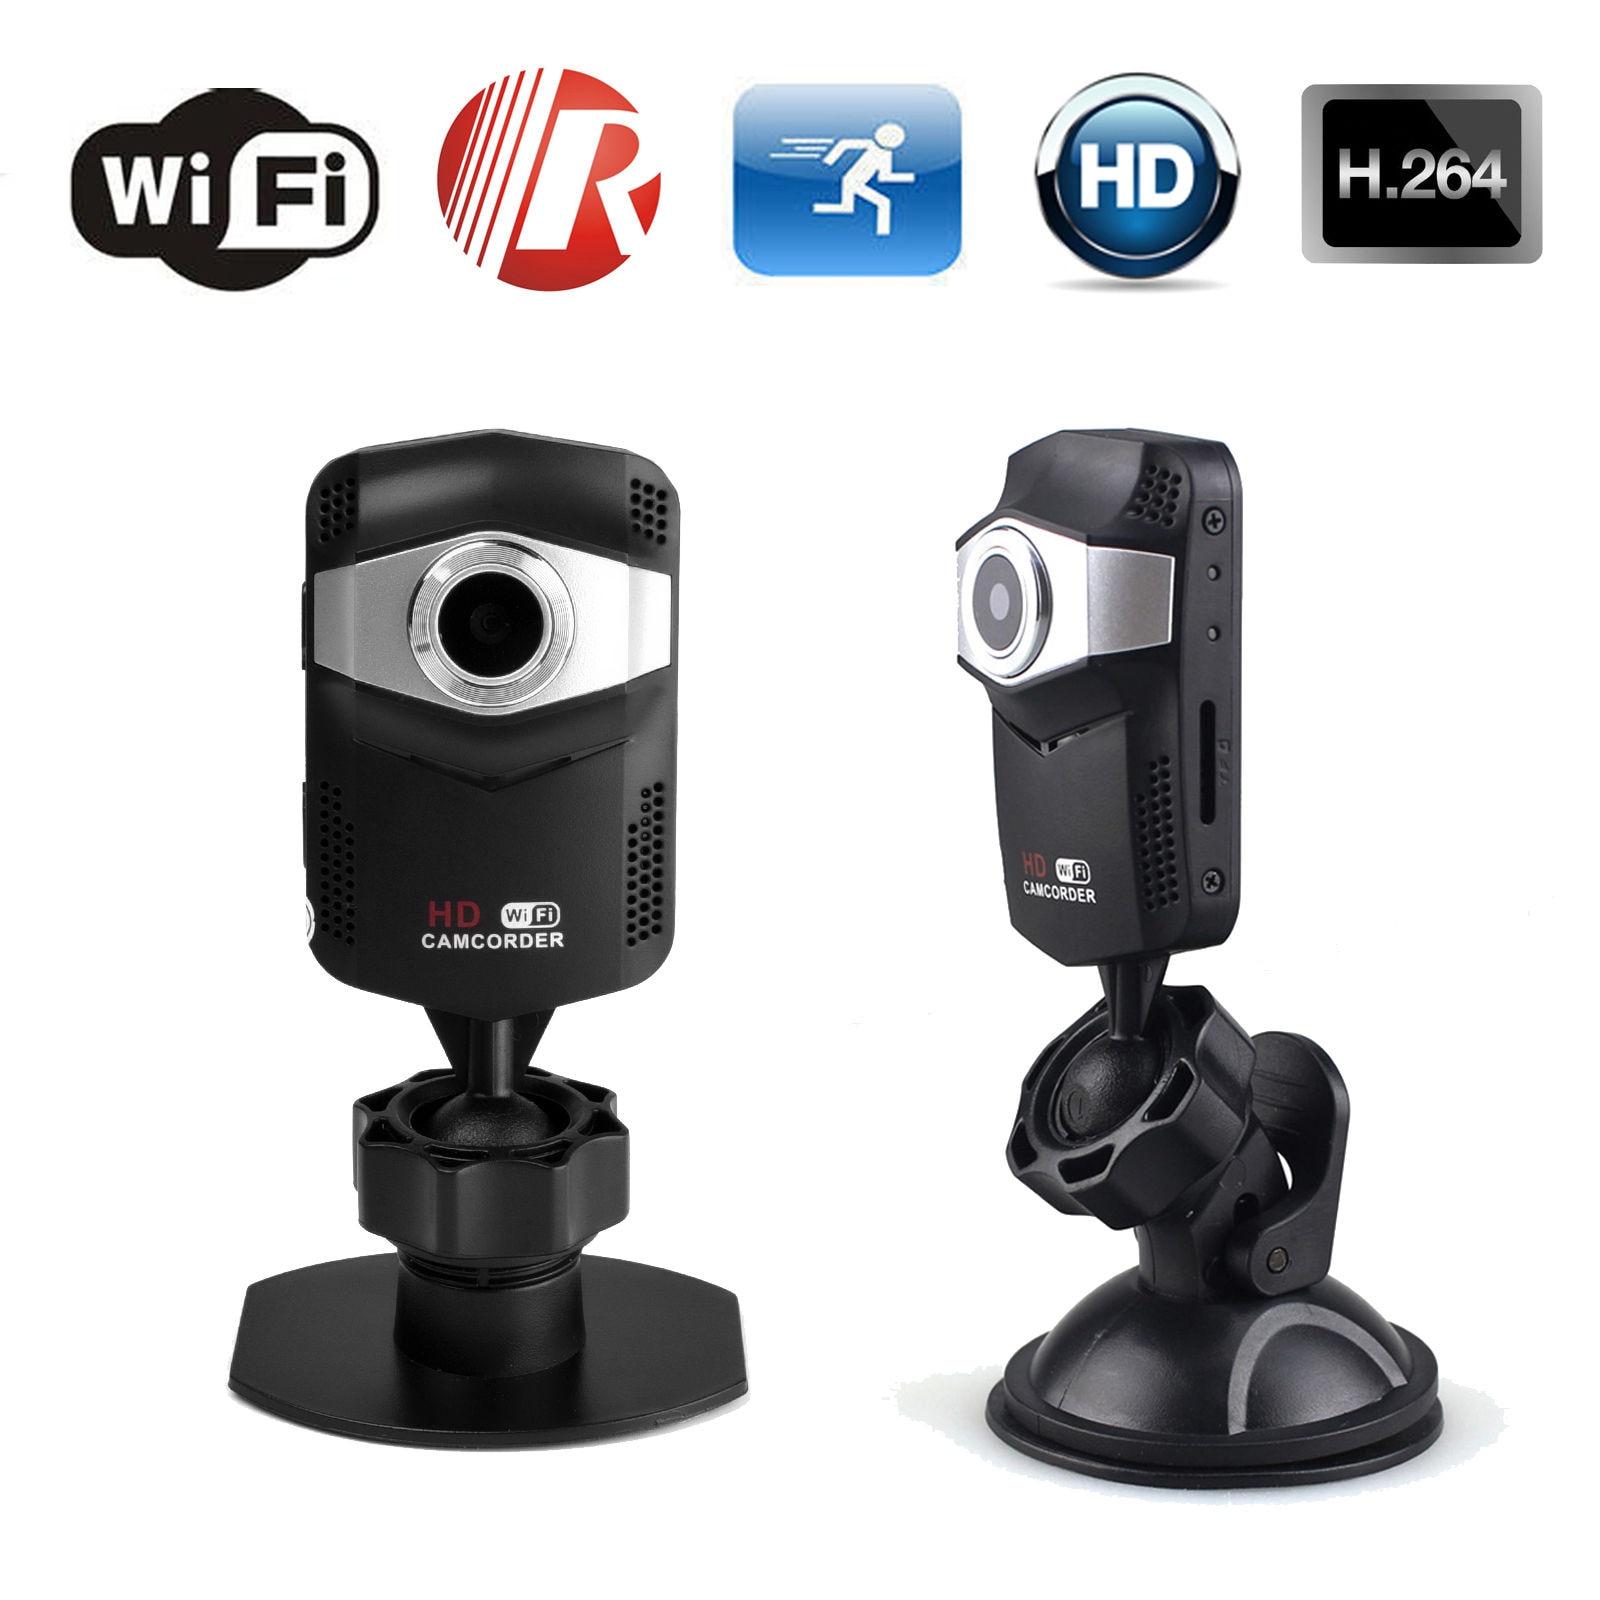 4GB Card+Wifi IP Mini Wireless HD 720P Motion Detect IR Network Security Camera DVR4GB Card+Wifi IP Mini Wireless HD 720P Motion Detect IR Network Security Camera DVR